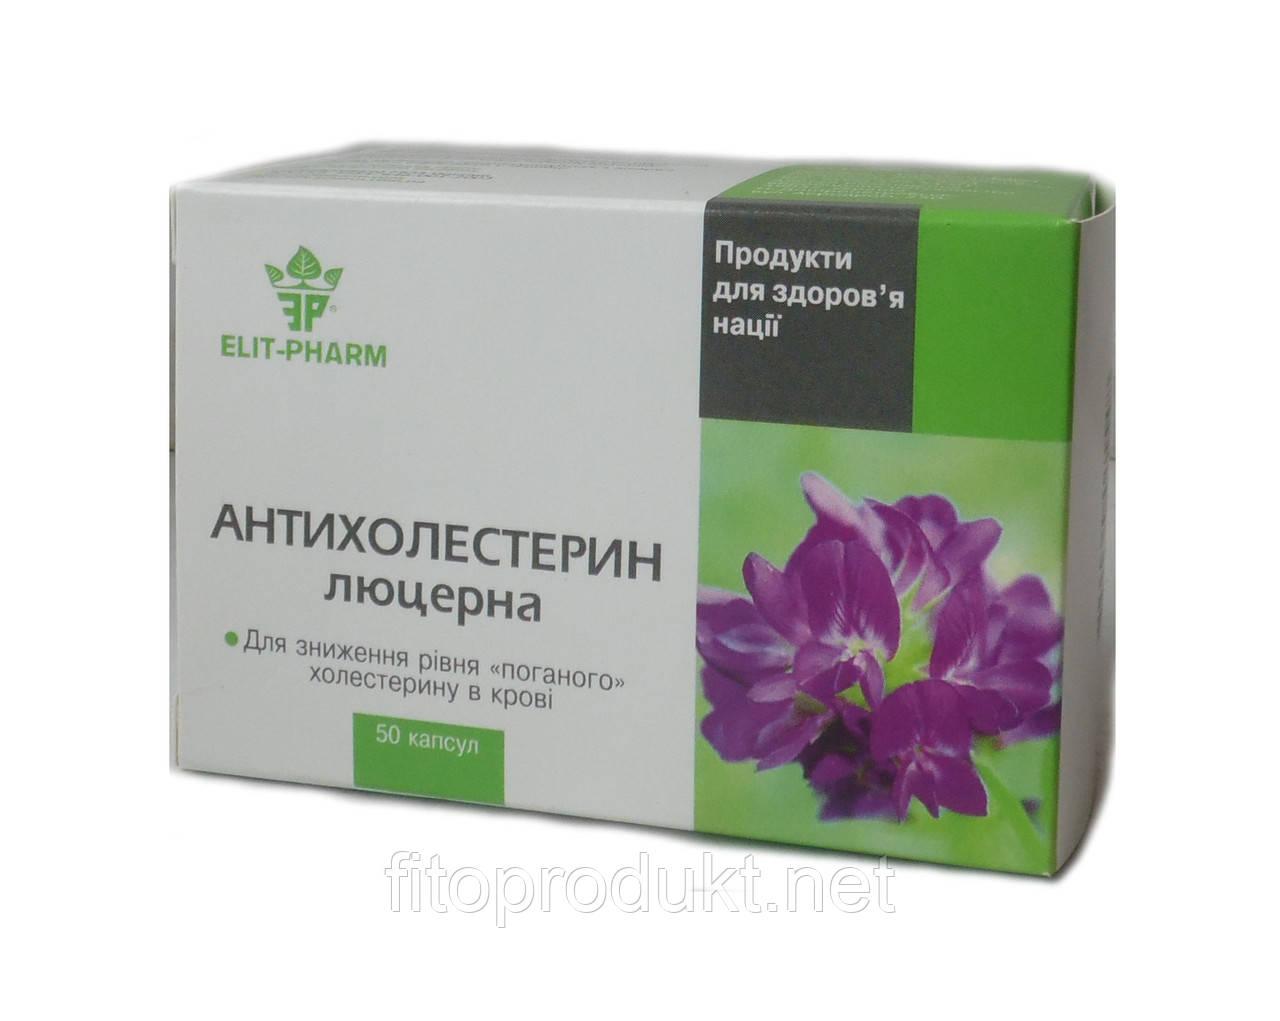 Антихолестерин люцерна для снижения уровня холестерина и сахара в крови 50 капсул Элит-фарм